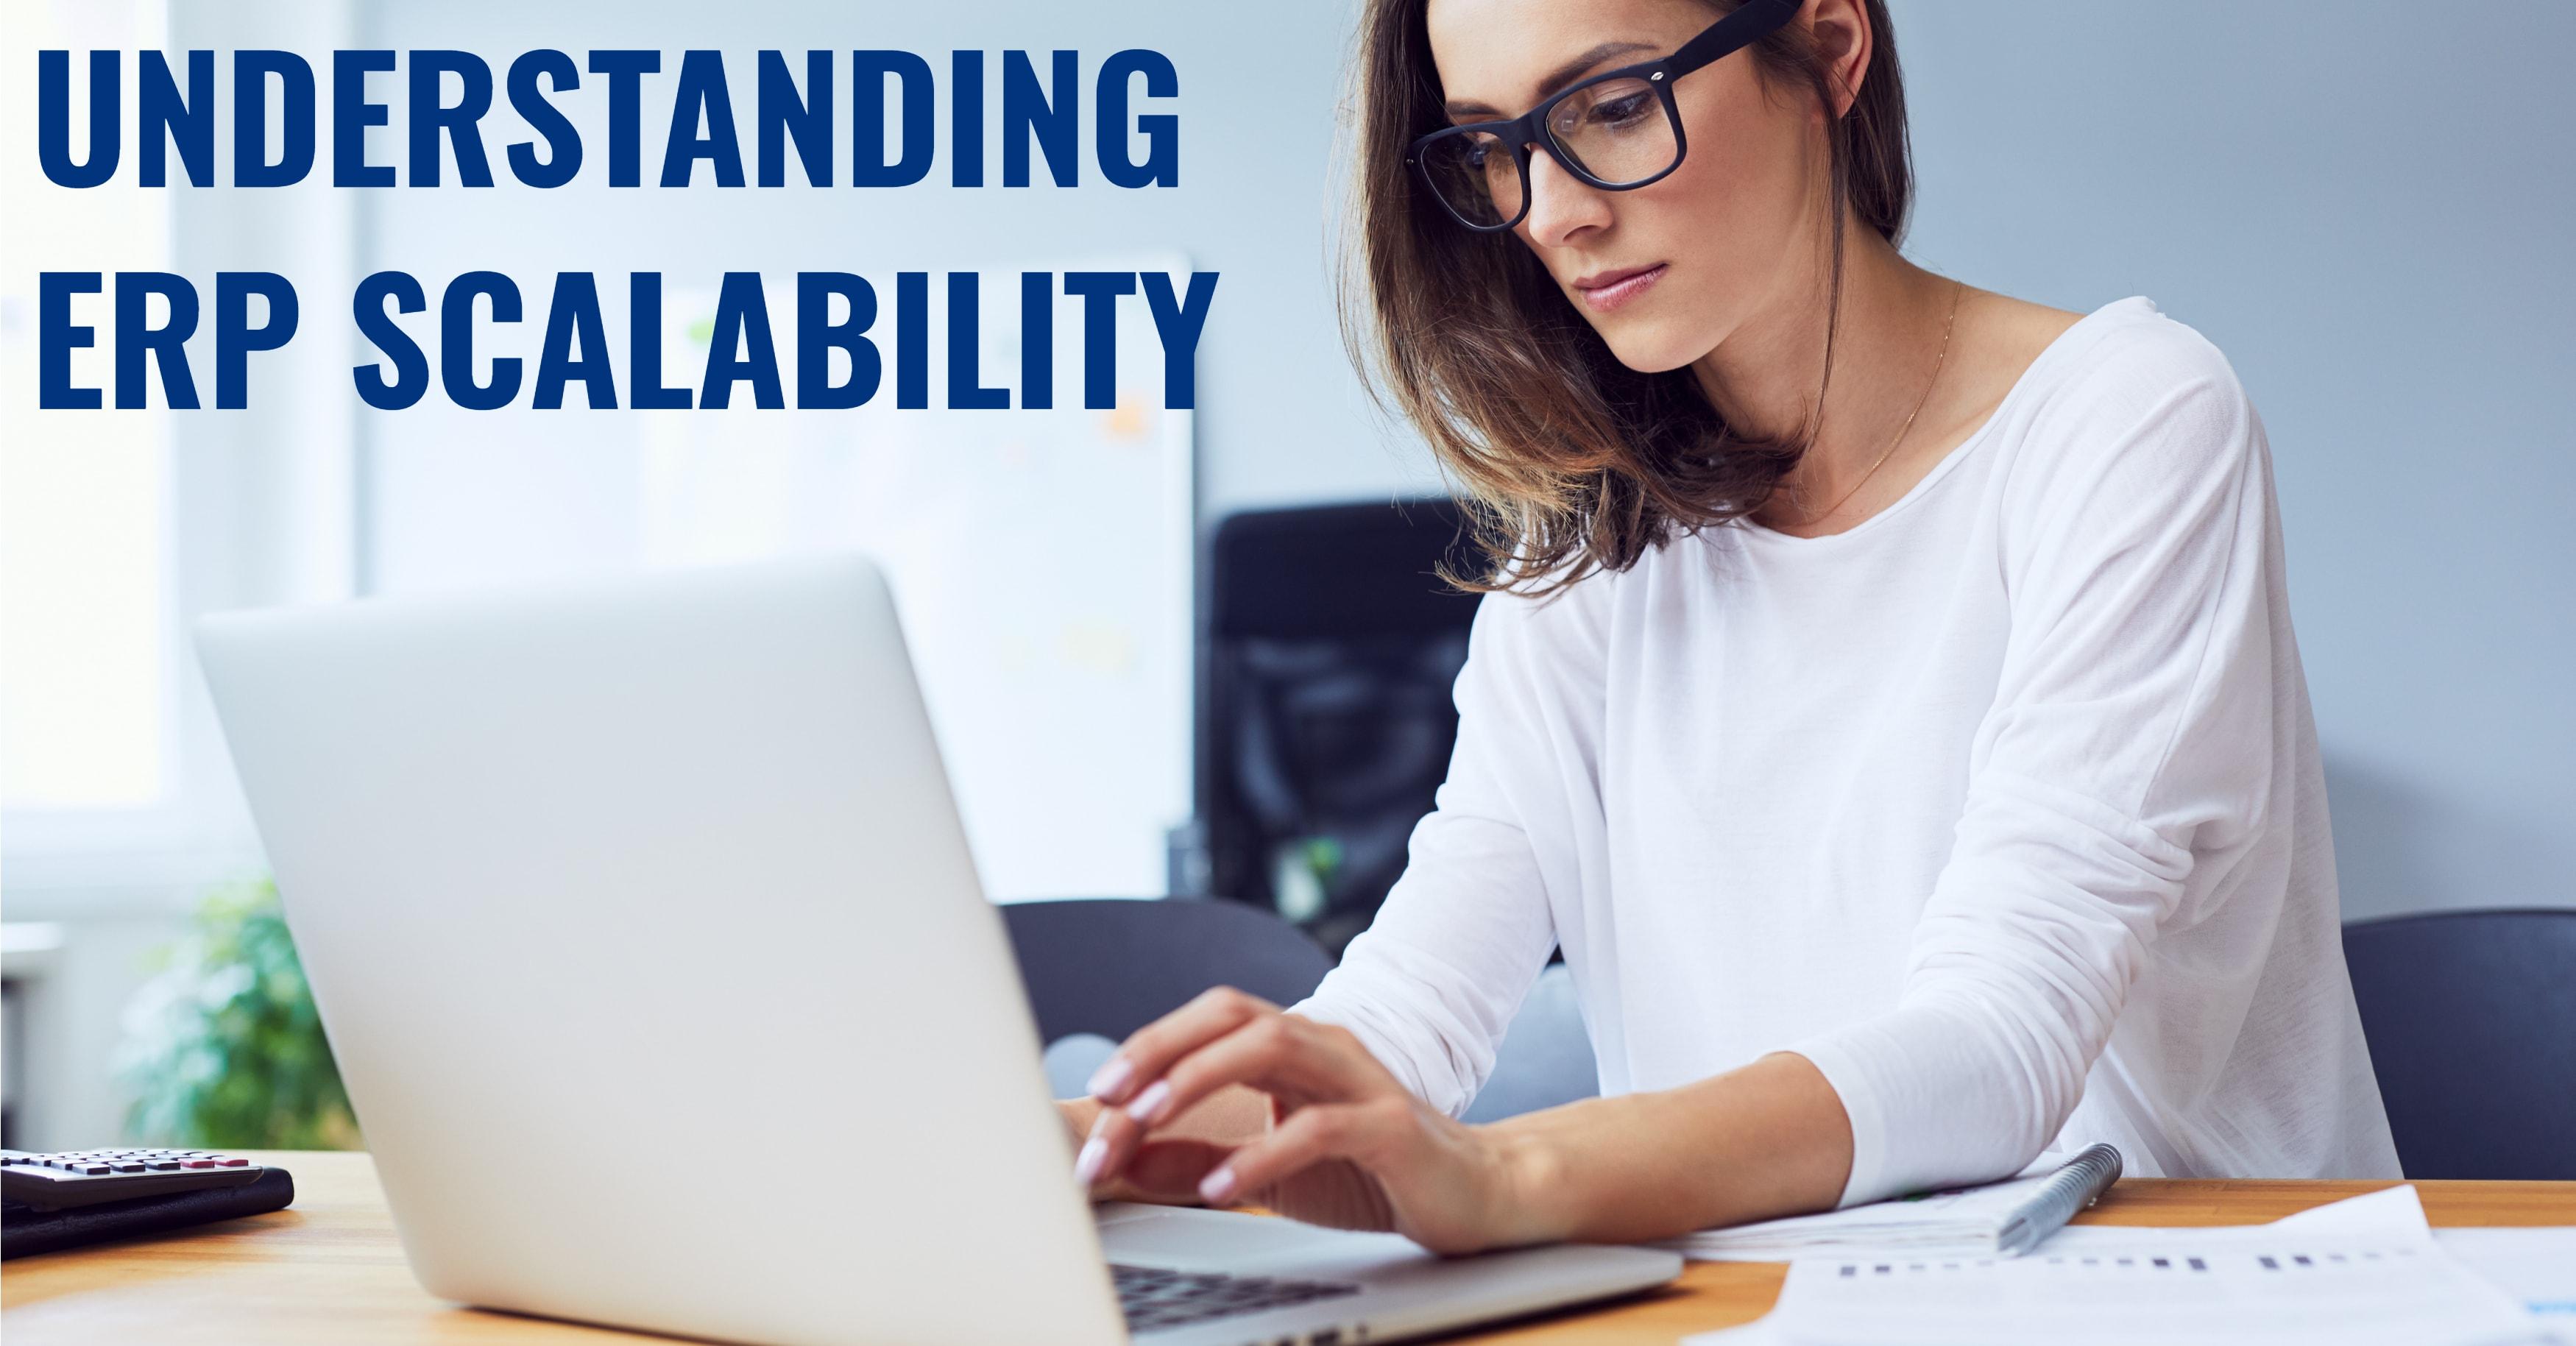 Understanding ERP Scalability